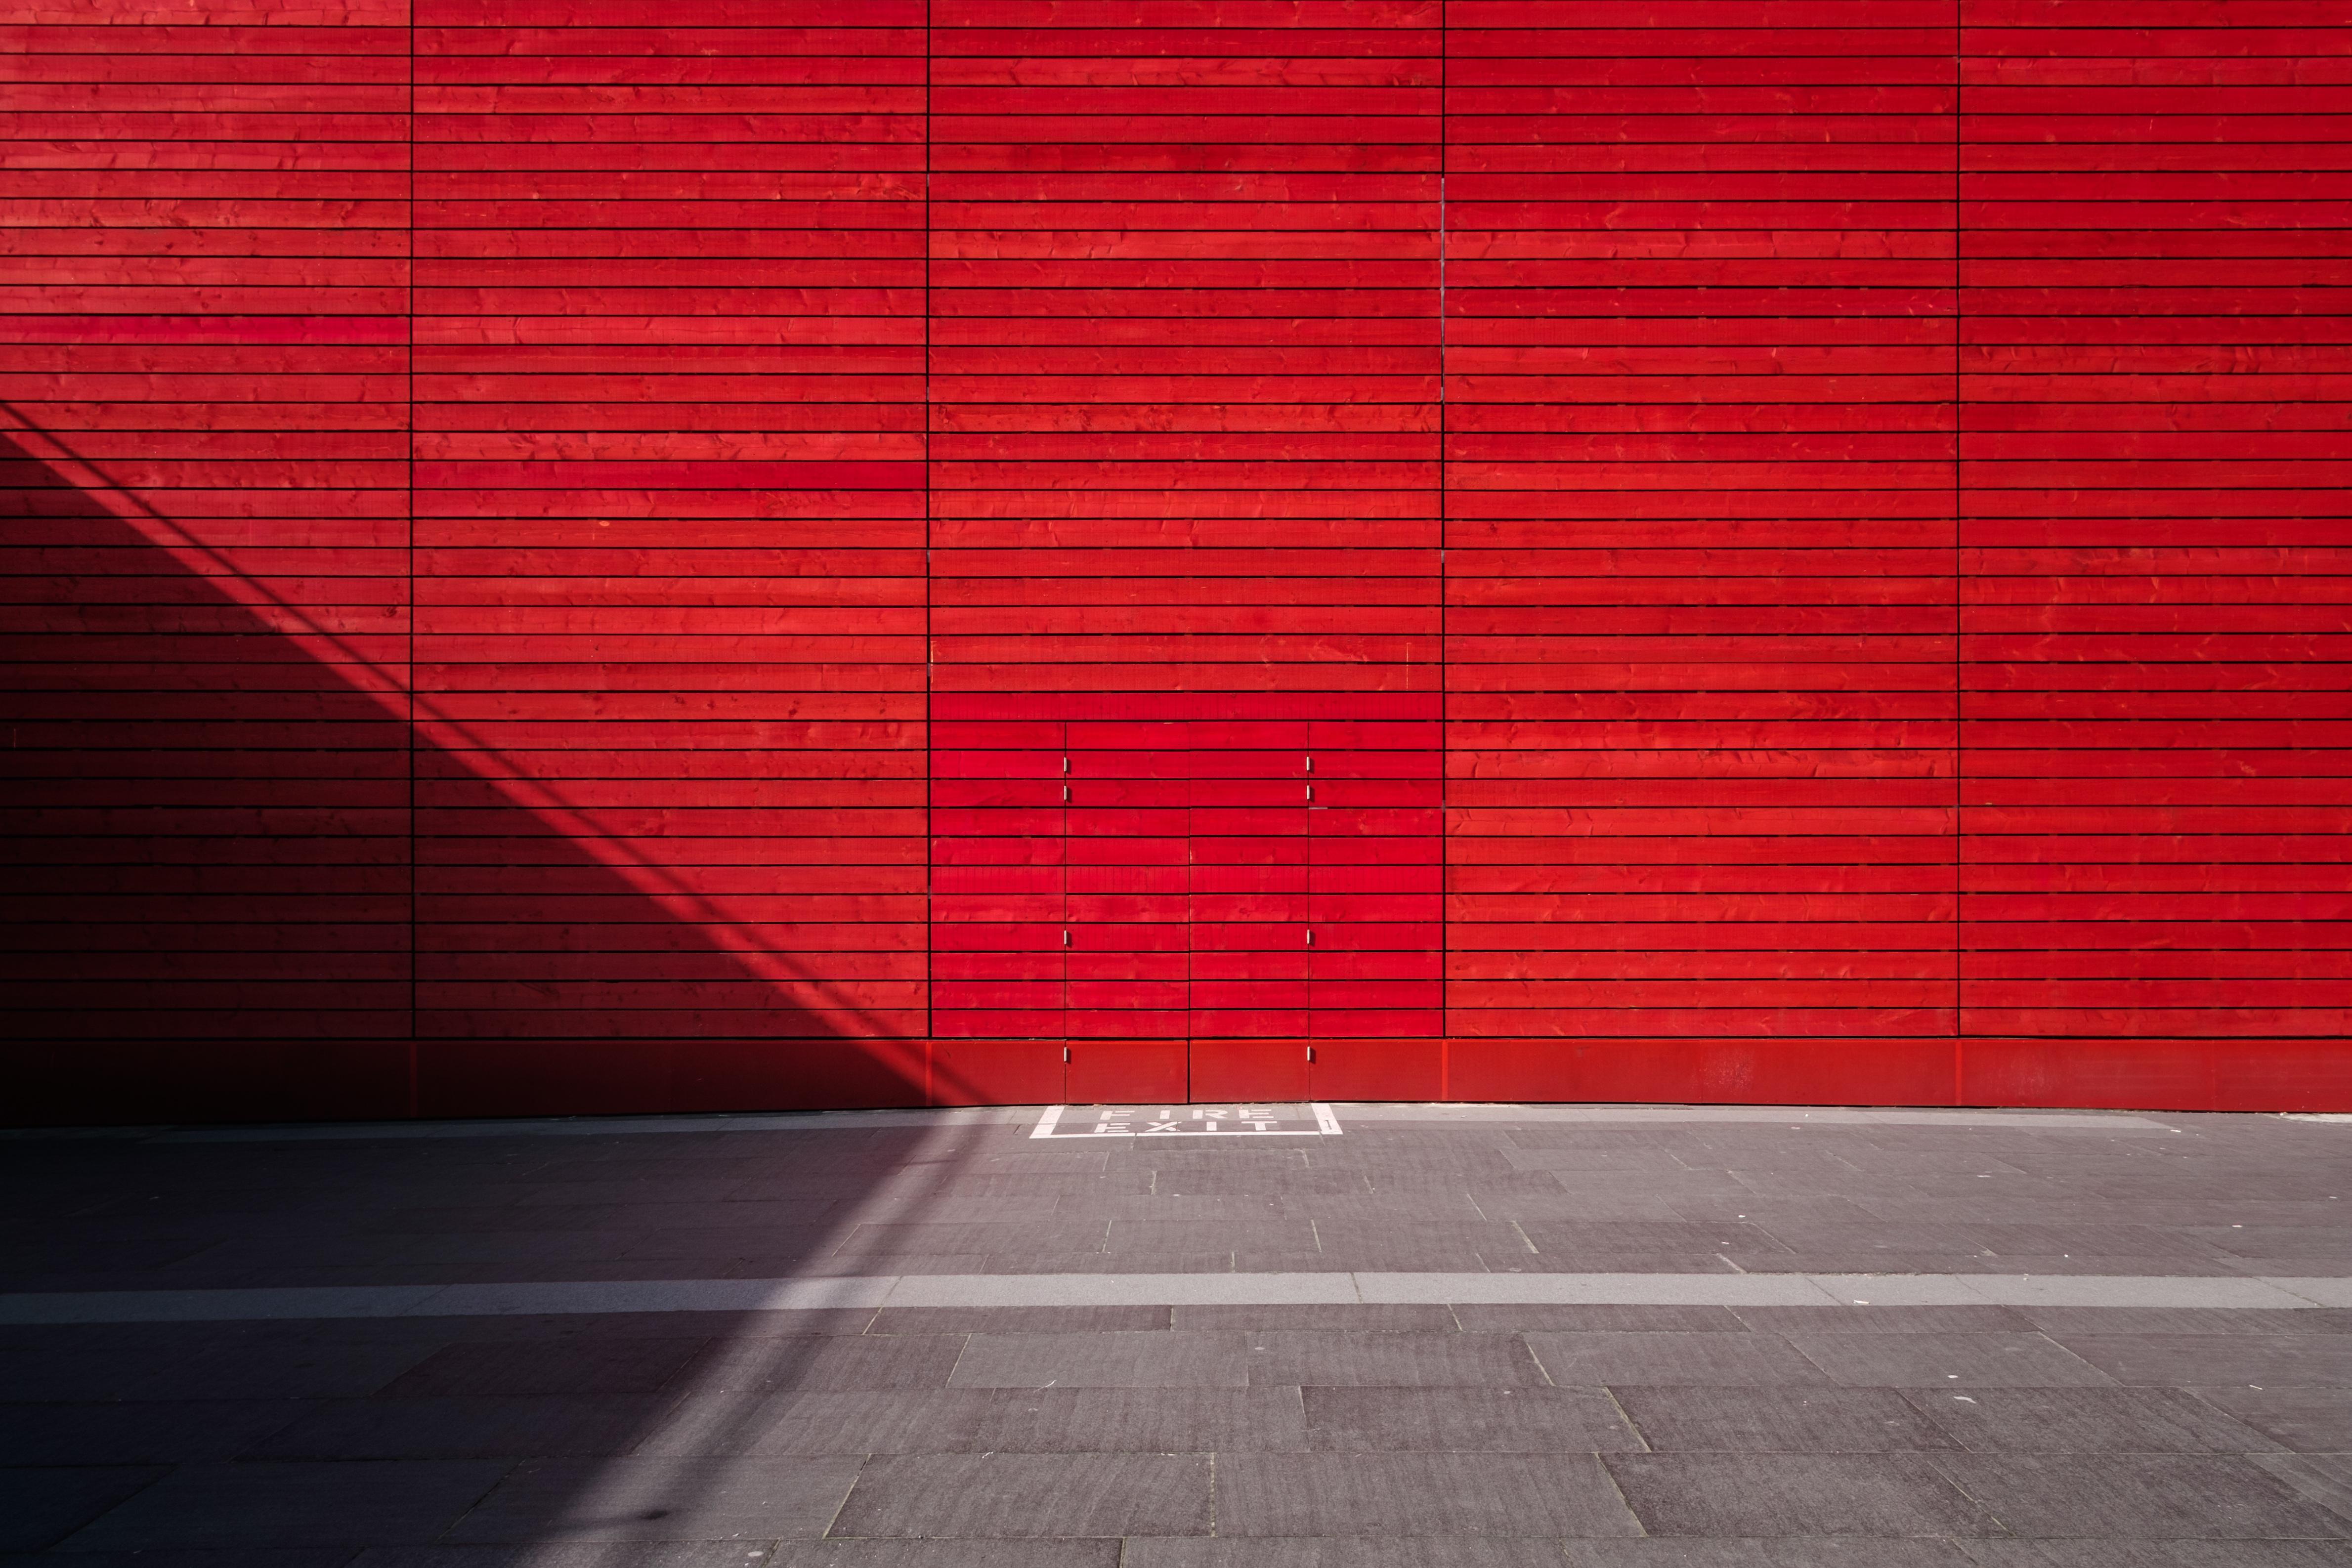 Light Architecture Wood Floor Wall Line Red Color Shadow Brick Lighting Interior Design Symmetry Window